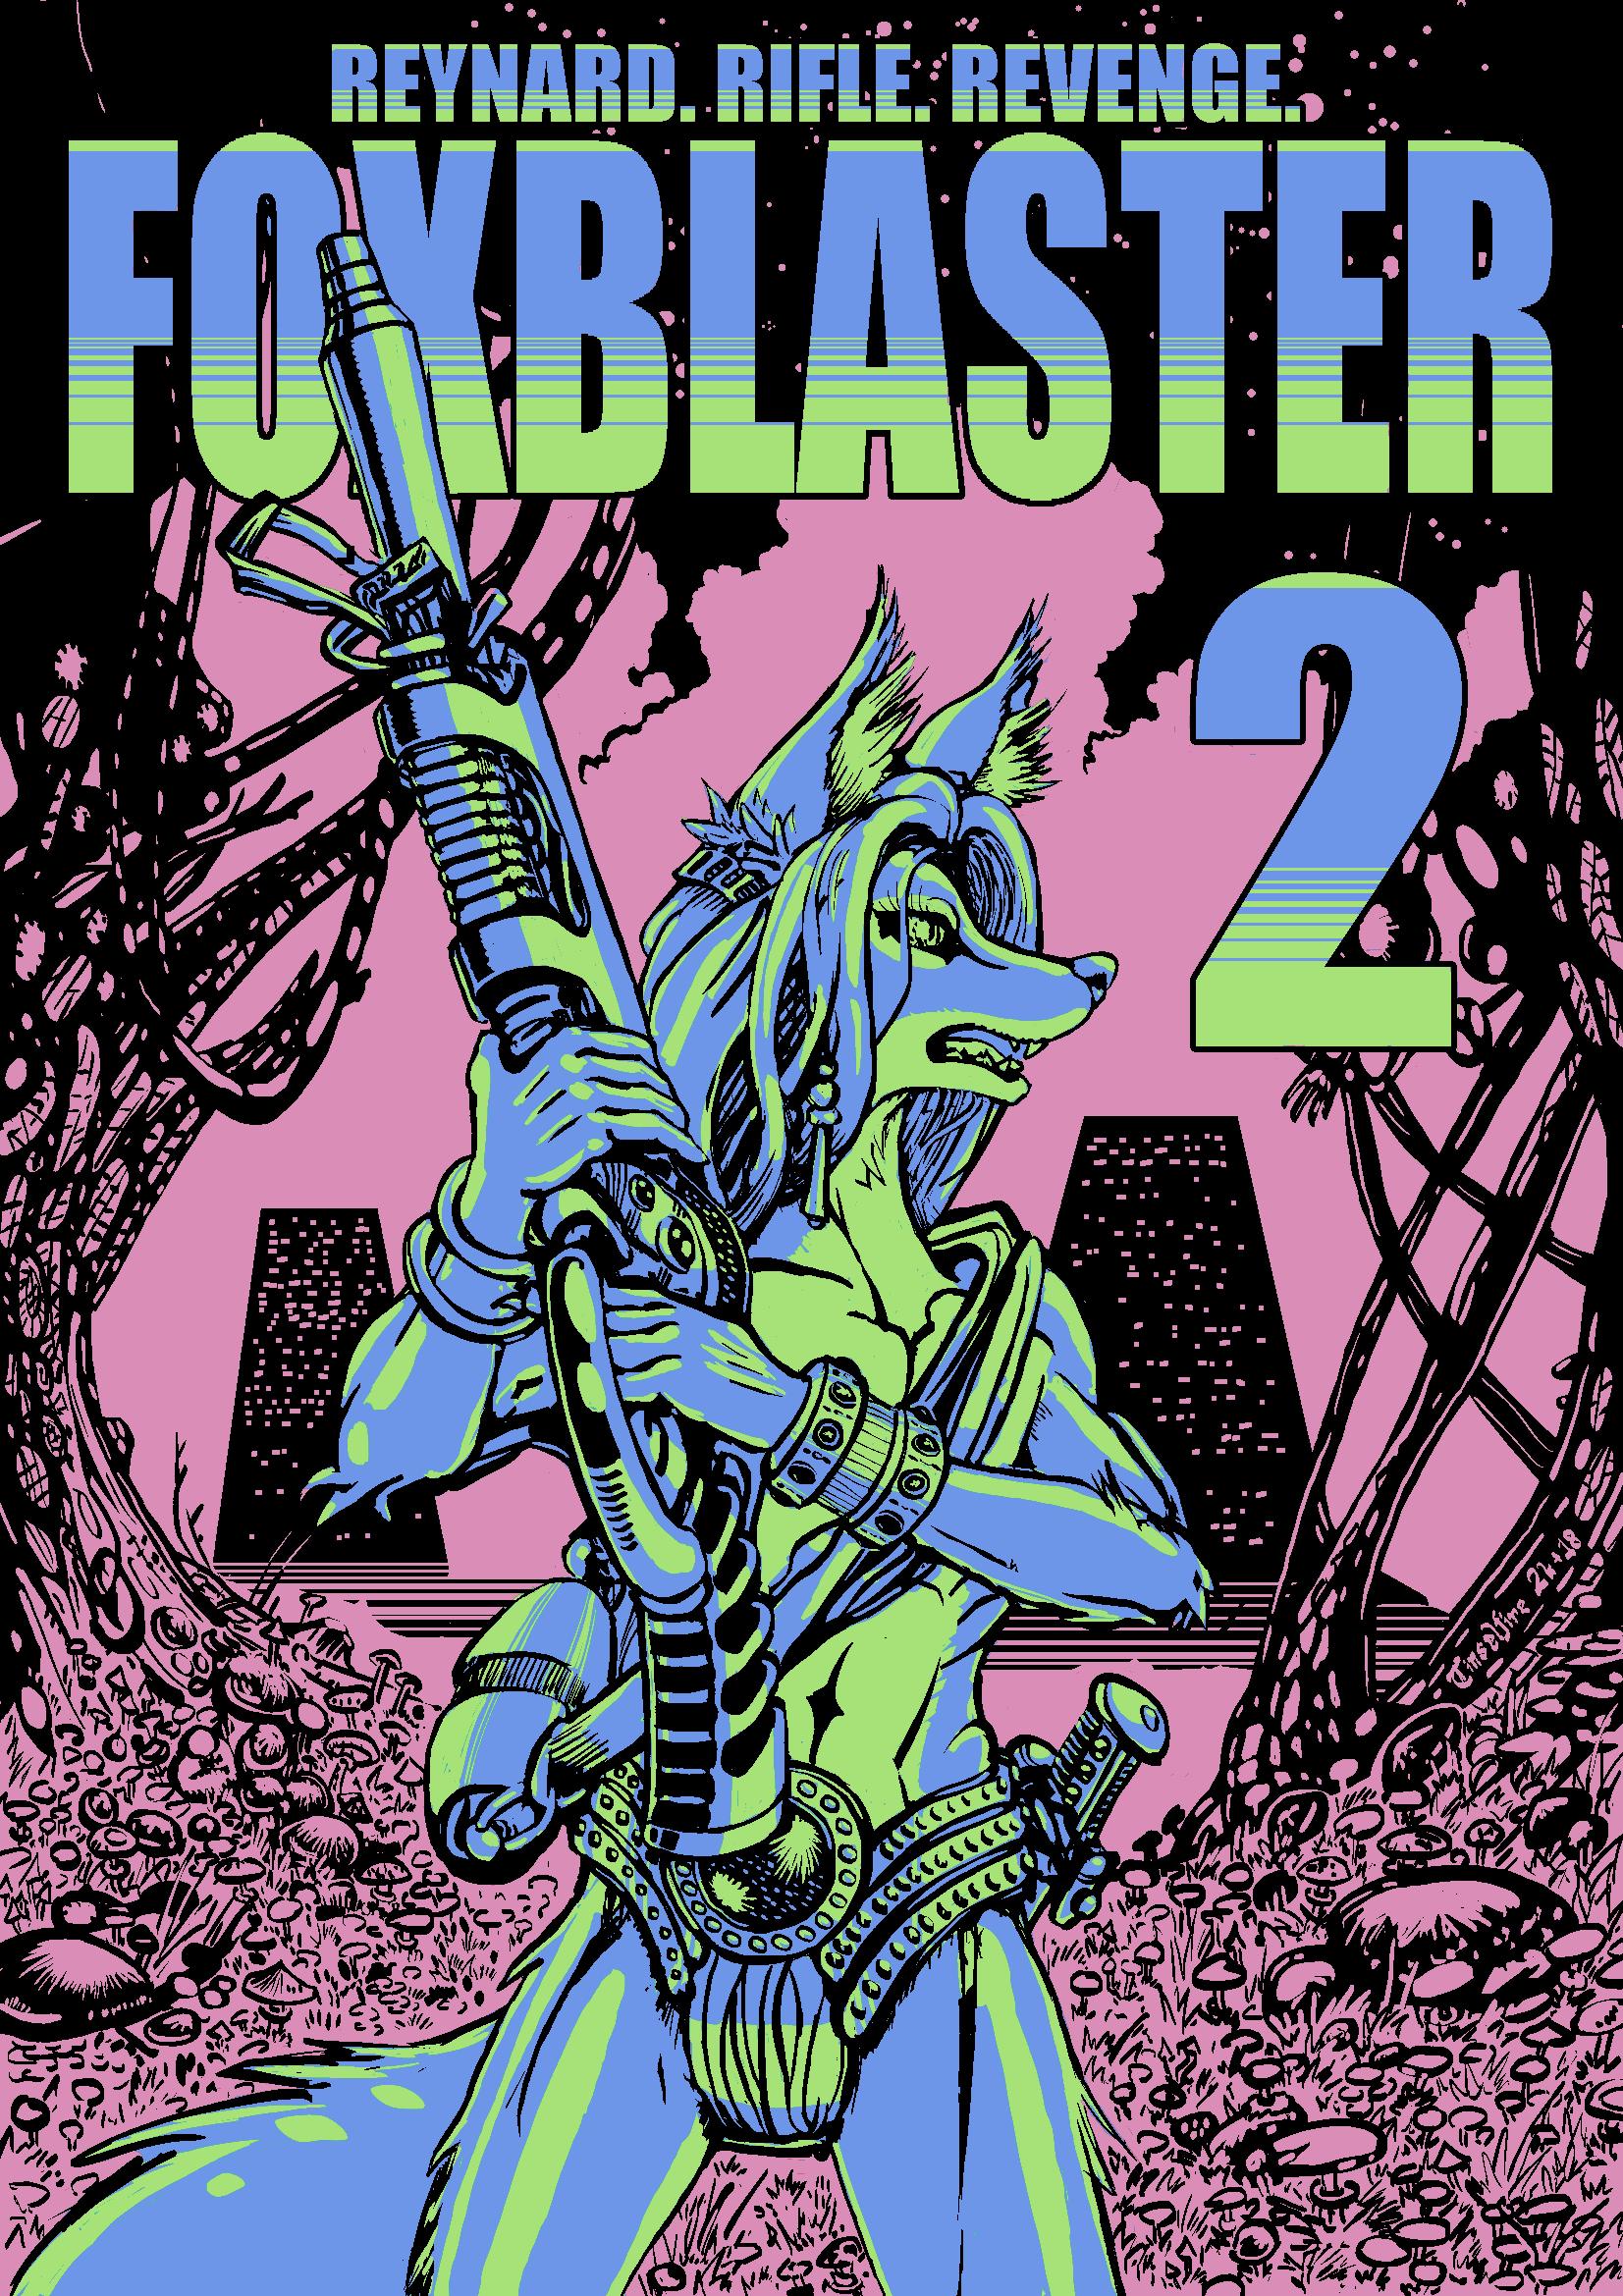 Anthro Challenge #152: Foxblaster 2 by Tinselfire